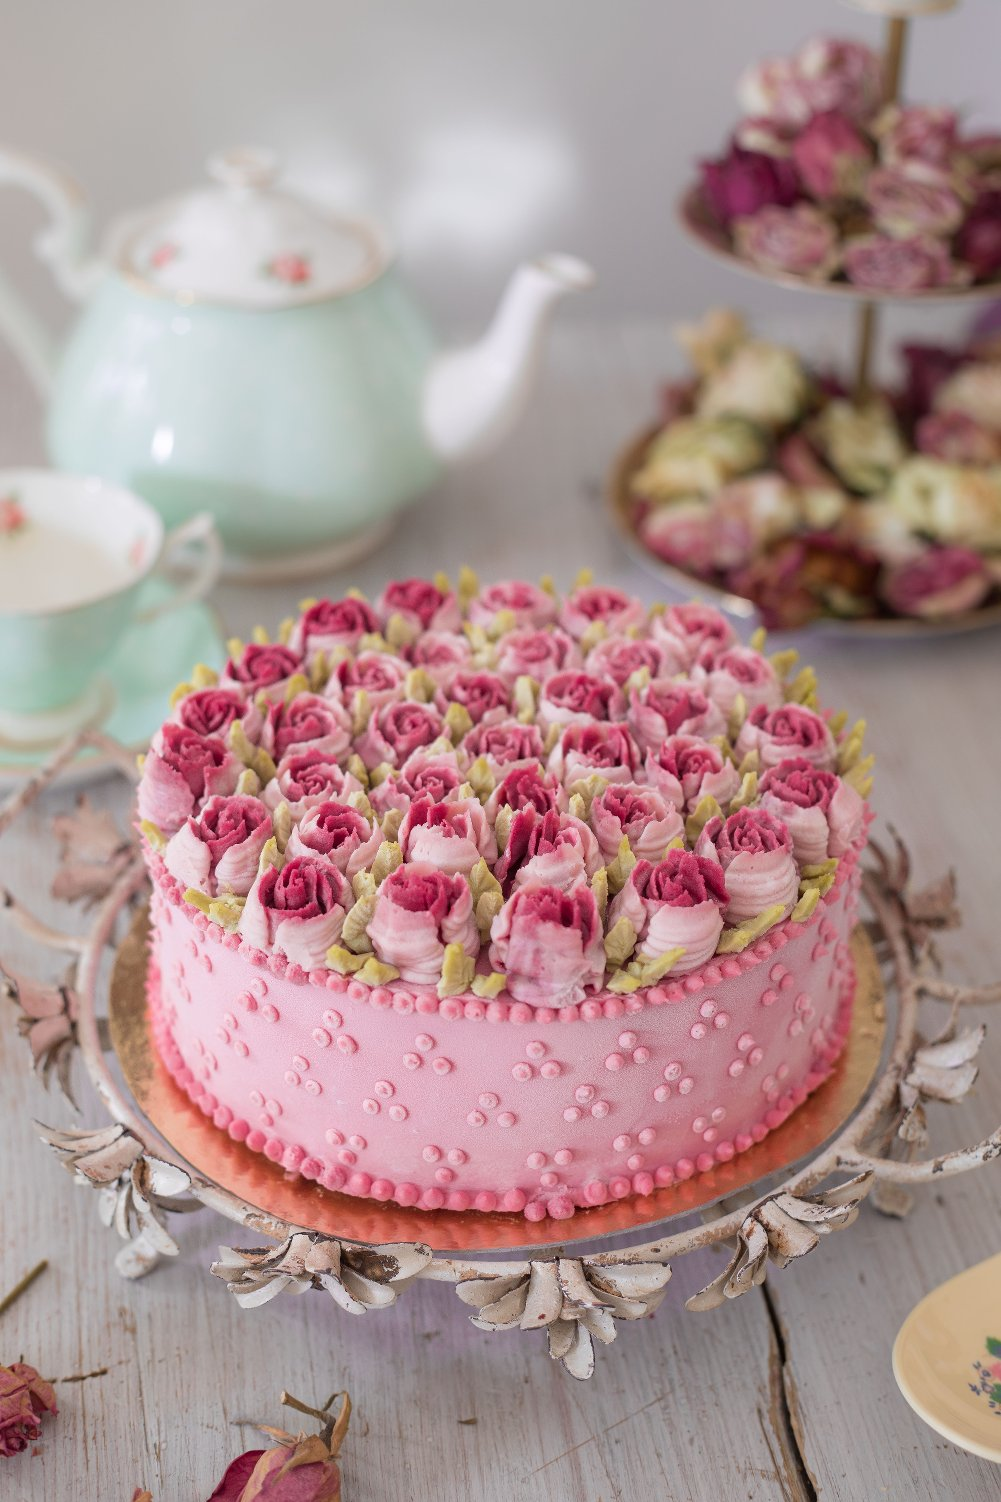 Birthday Carrot Cake Decoration